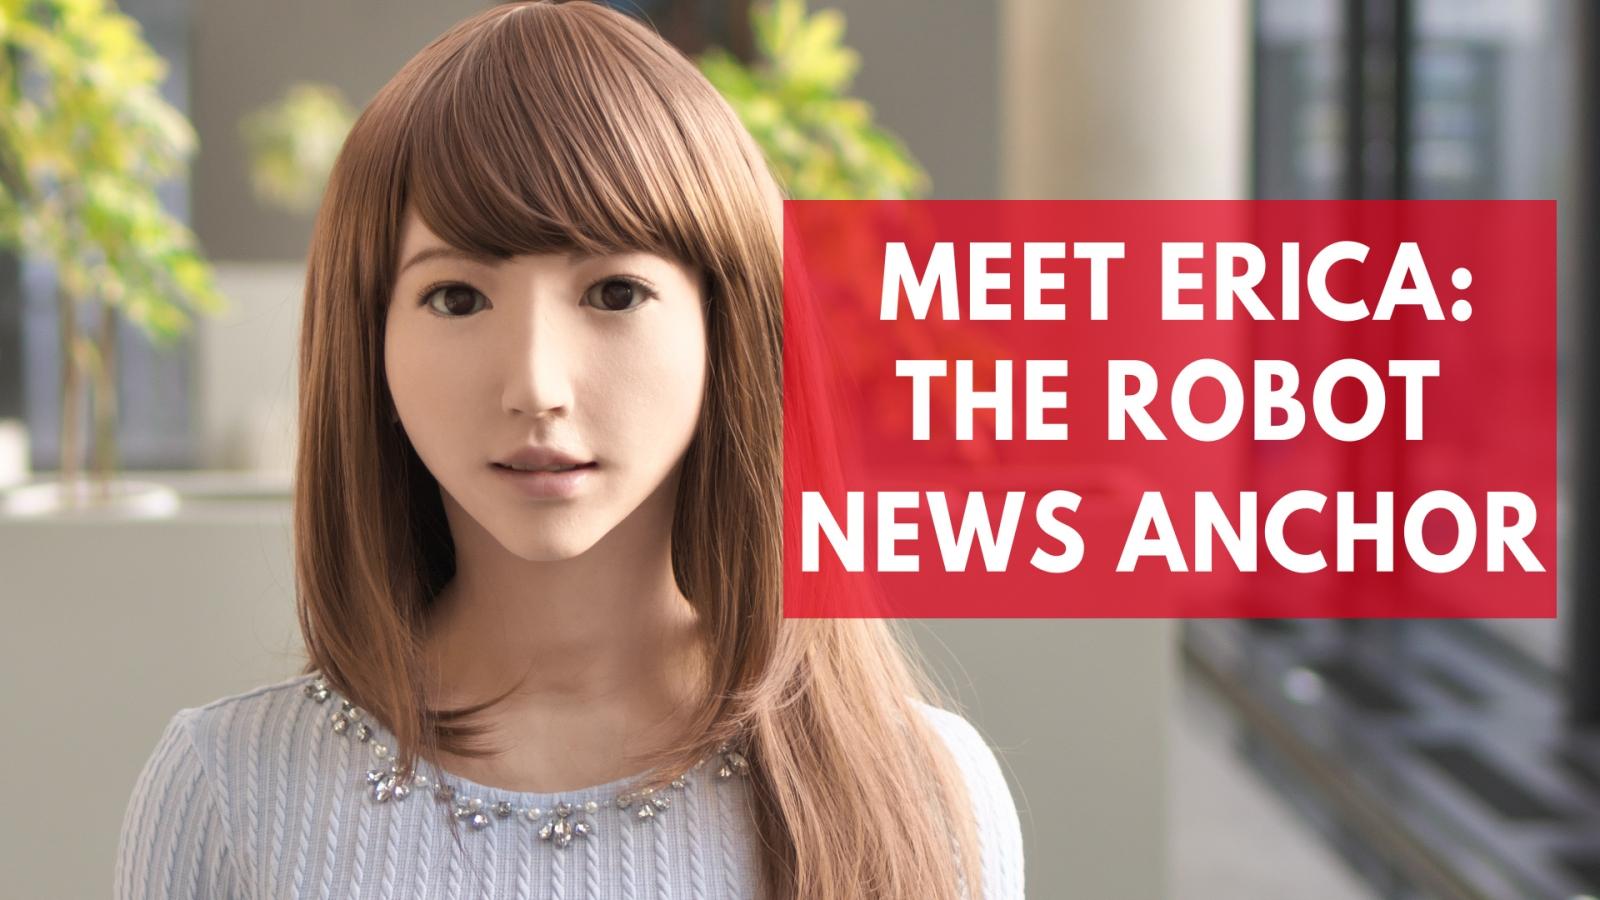 meet-erica-the-robot-news-anchor